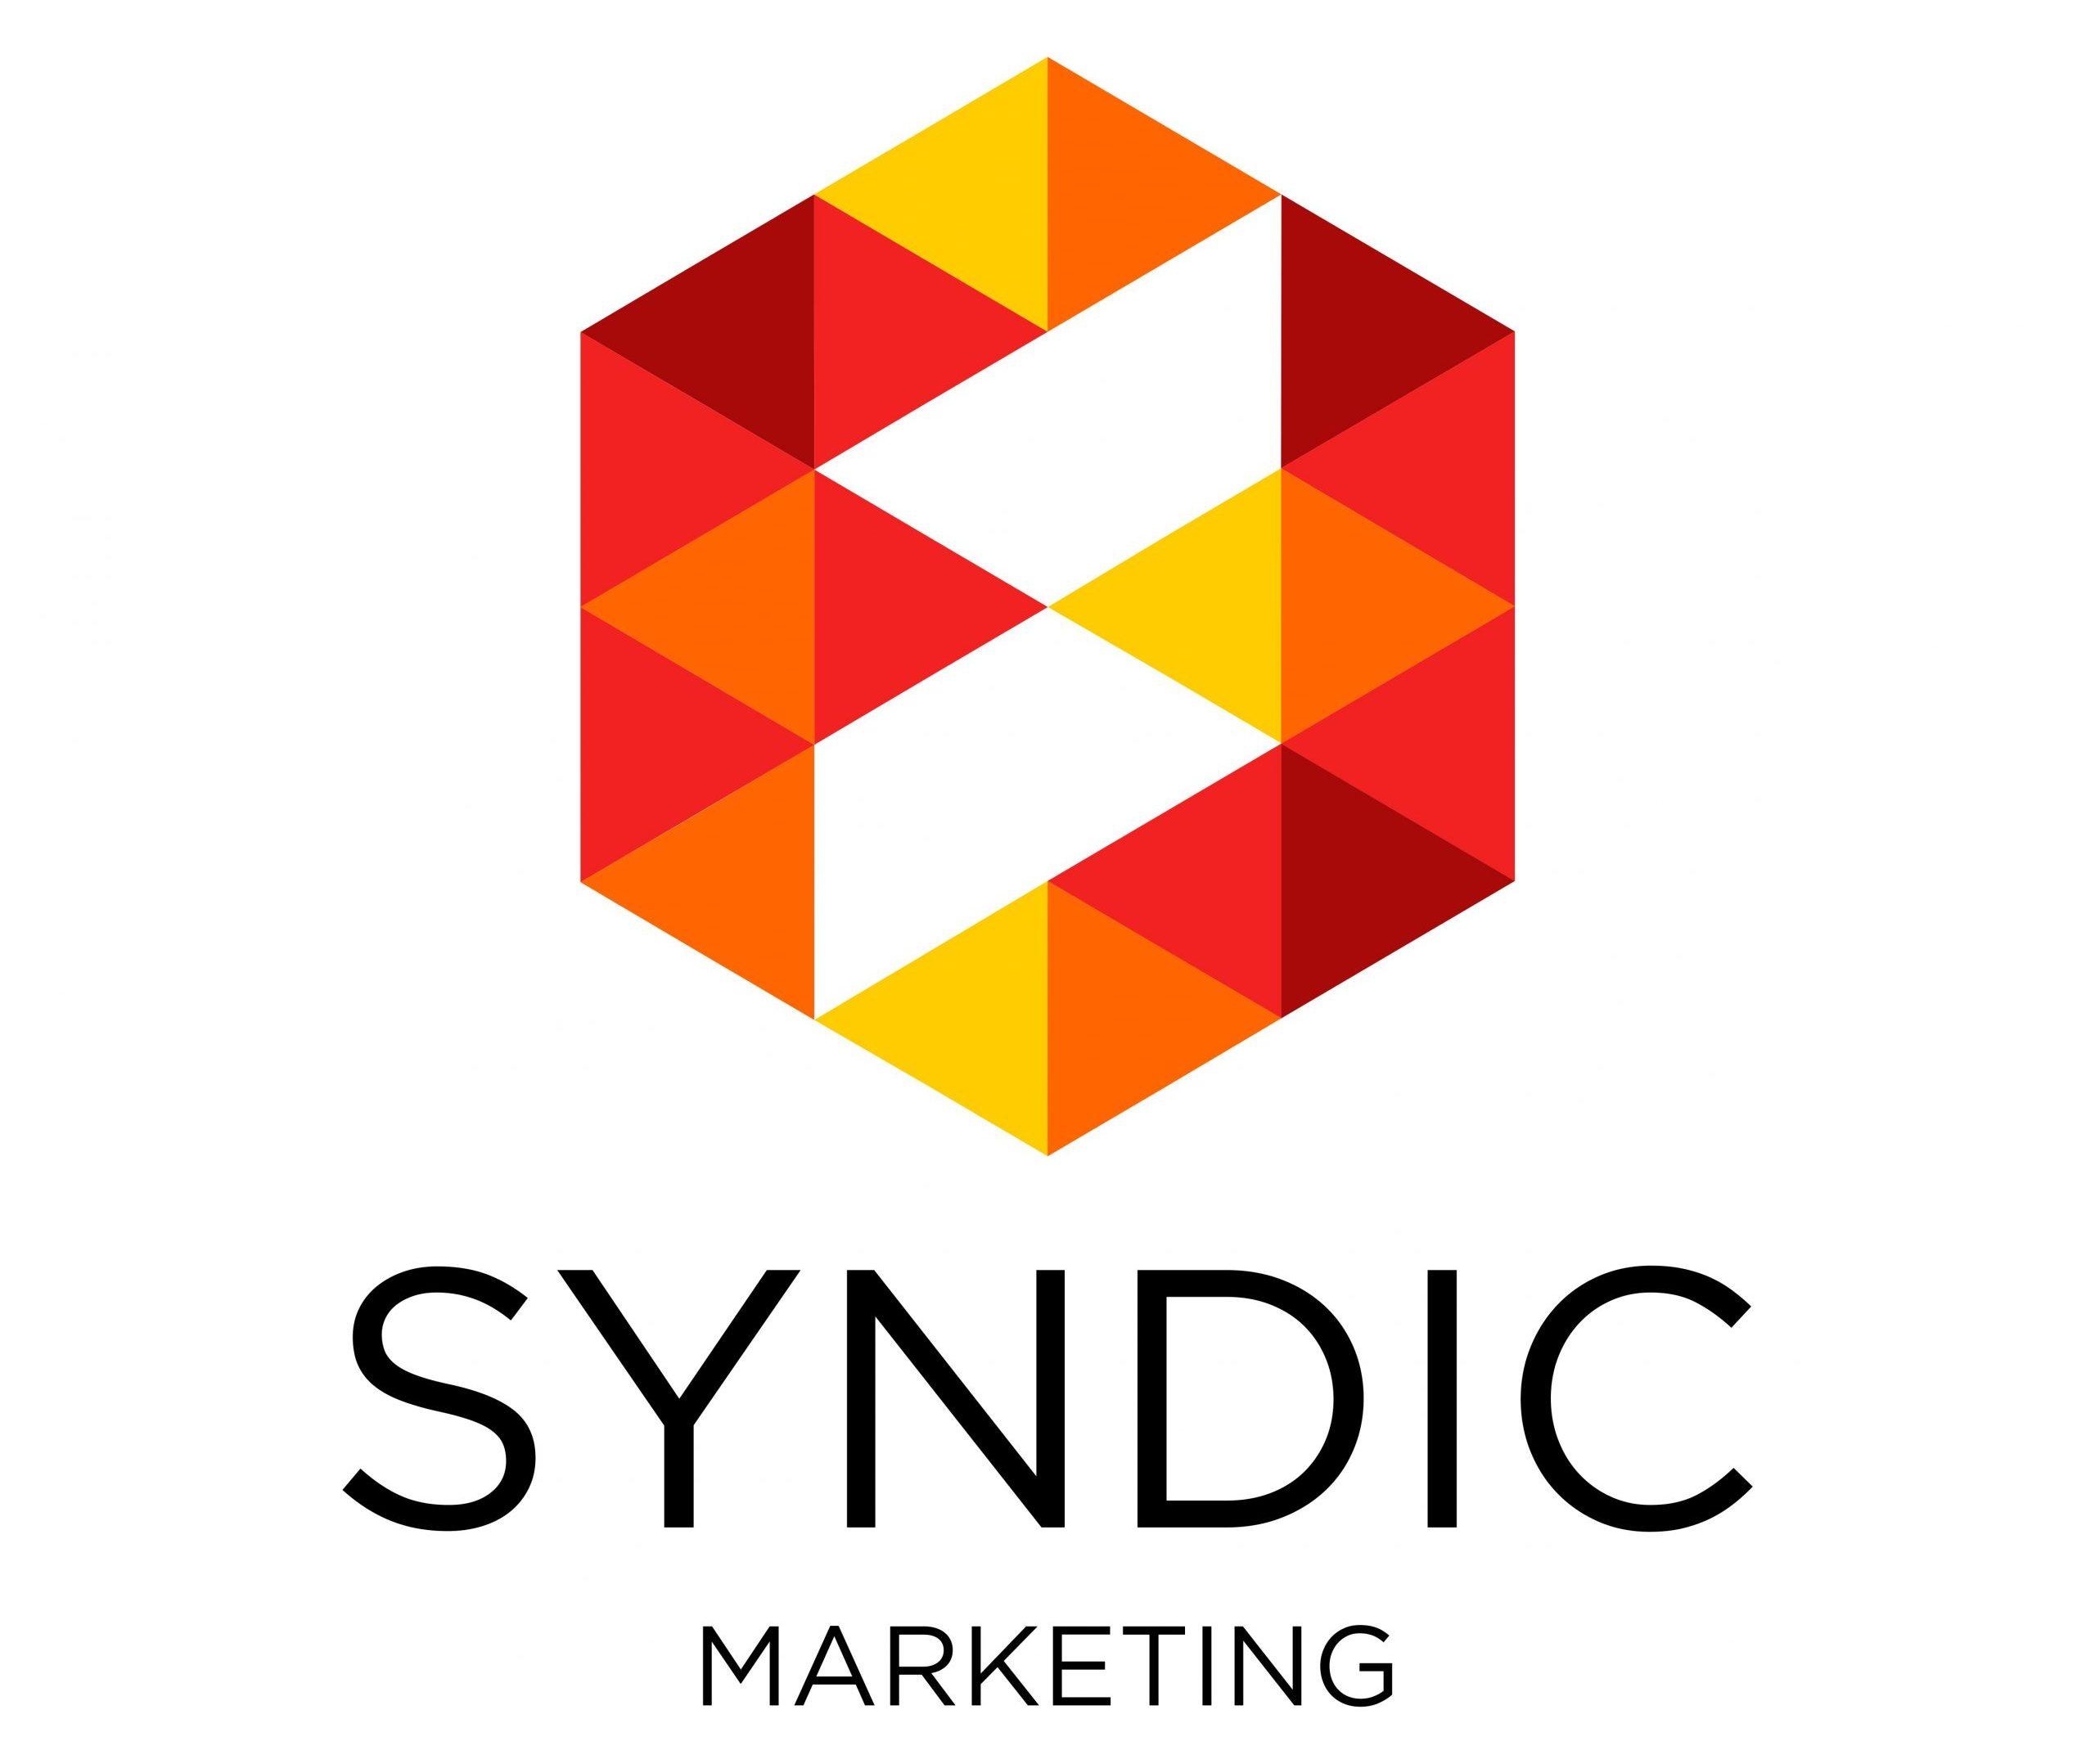 Syndic Marketing